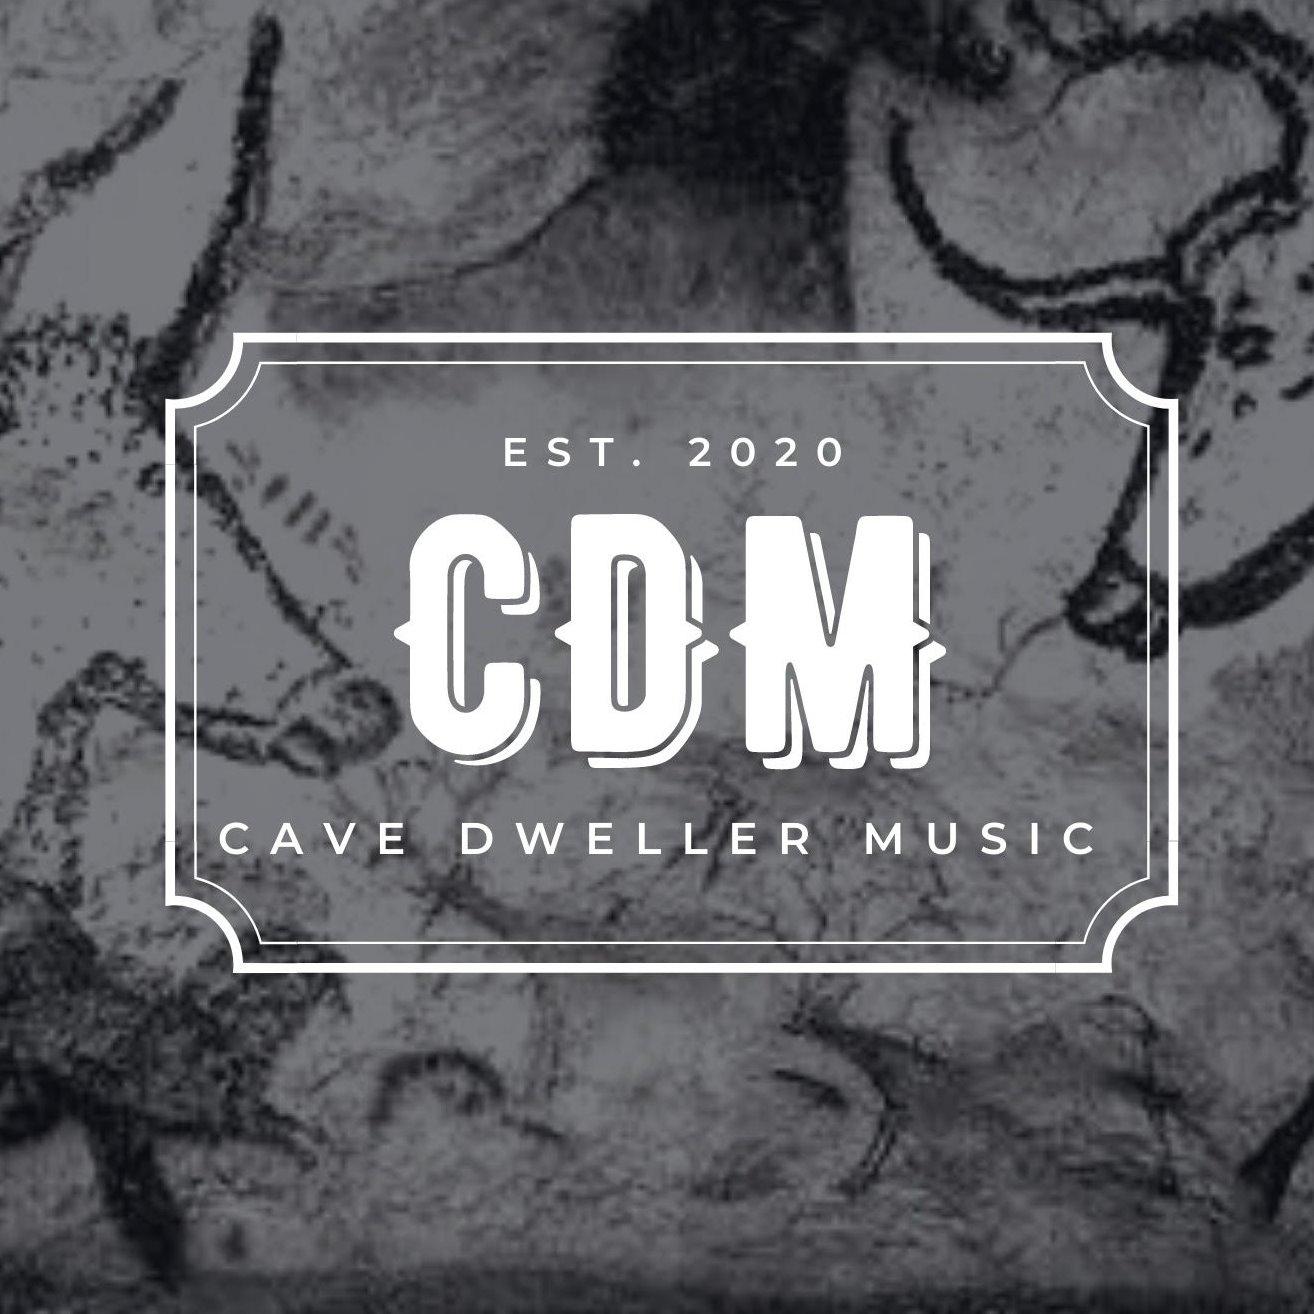 Cave Dweller Music